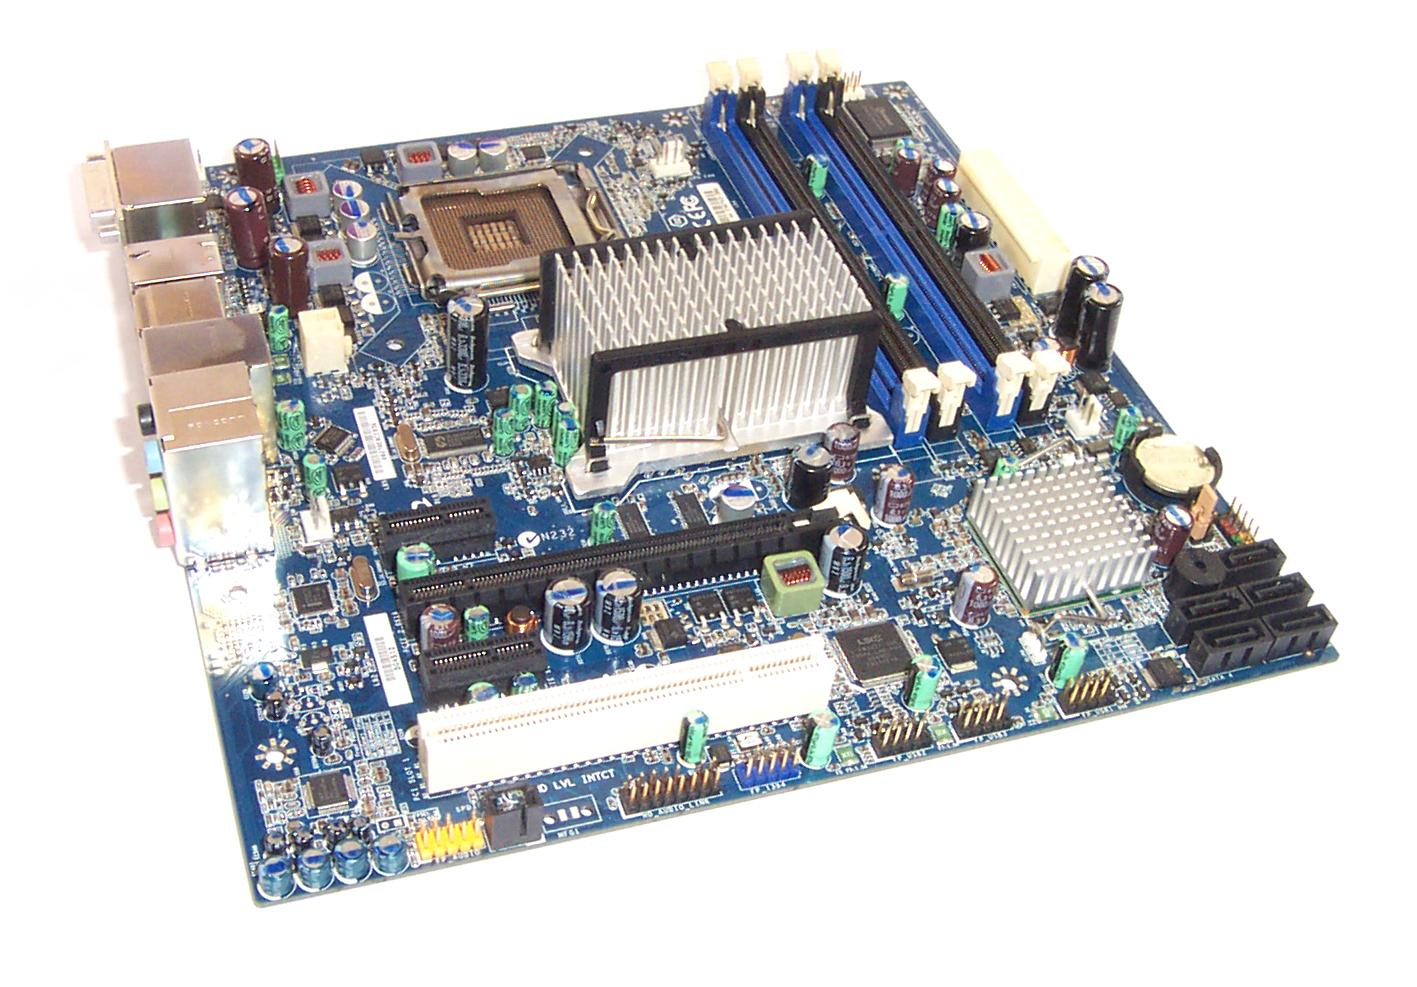 UNTESTED Intel E46743-302 Socket 775 Motherboard